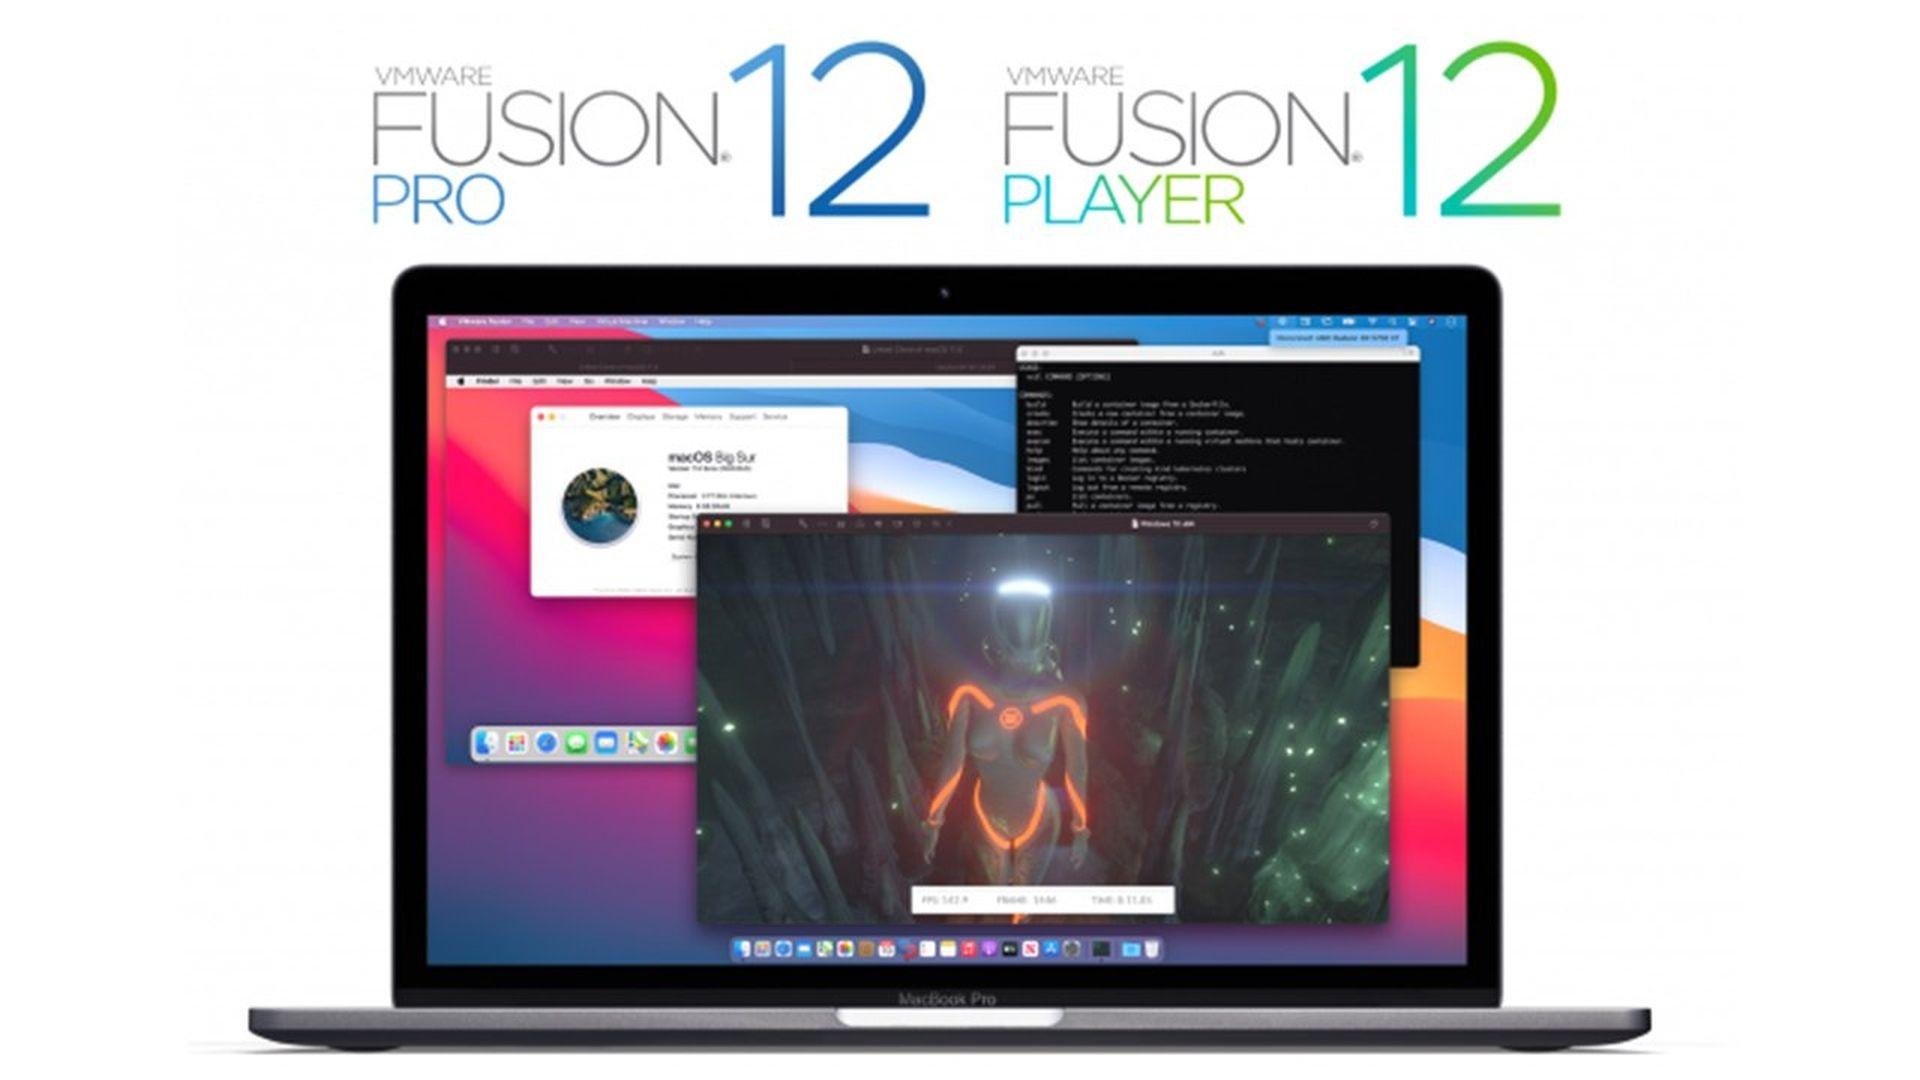 VMware ma dodać Fusion 12 z obsługą macOS Big Sur i eGPU